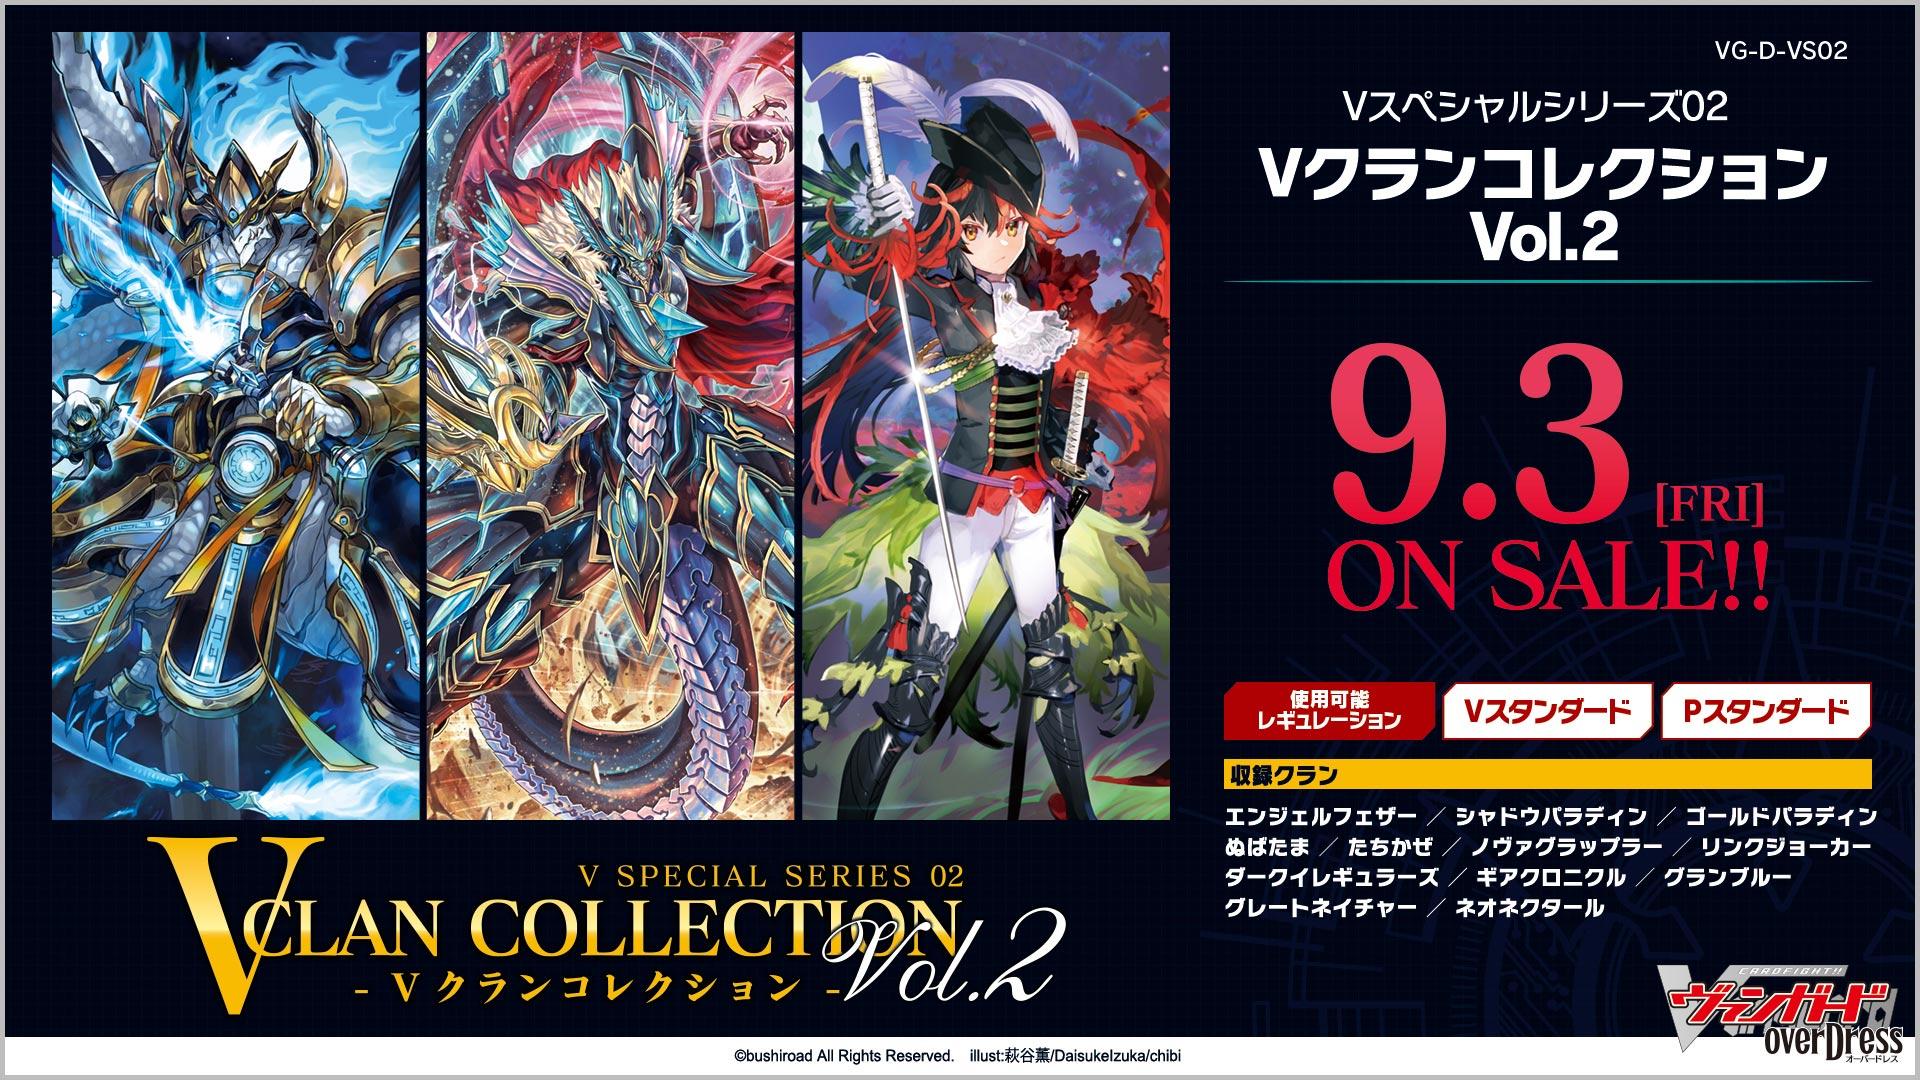 【D-VS02】「Vクランコレクション Vol.2」